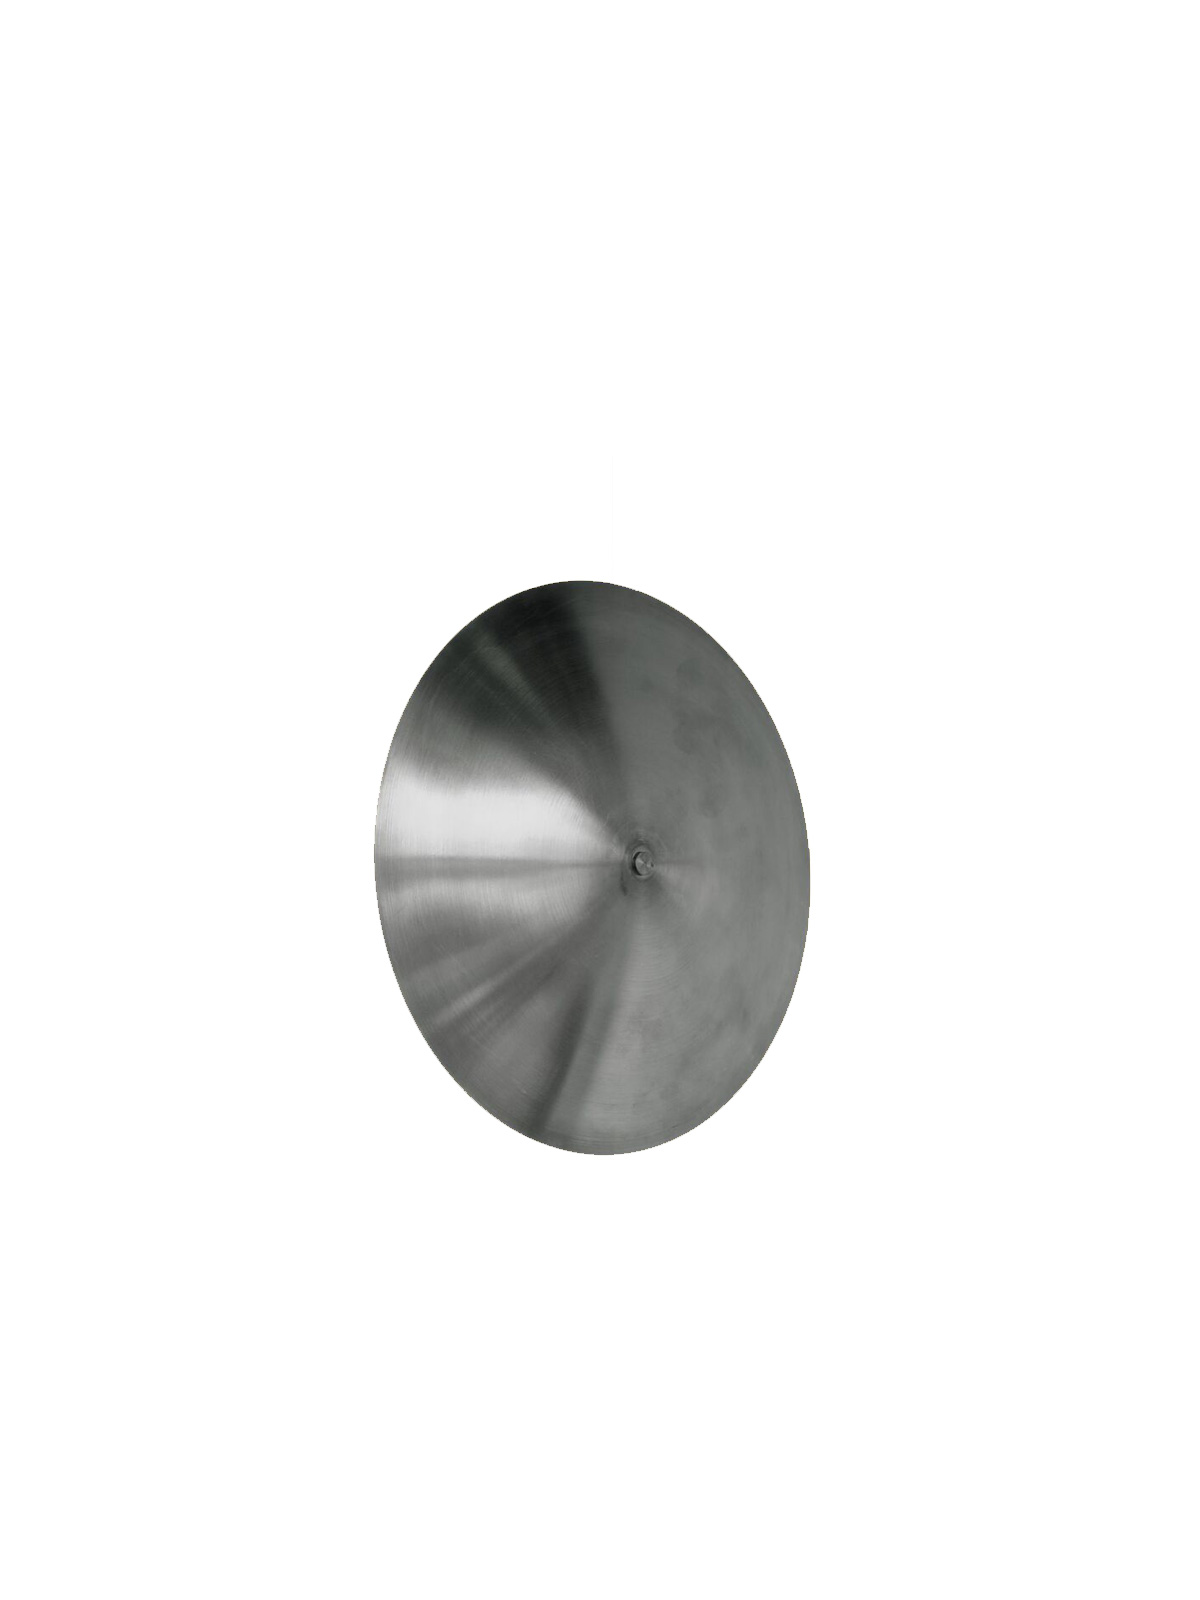 Chronalights V Steel LED Leuchten von Graypants